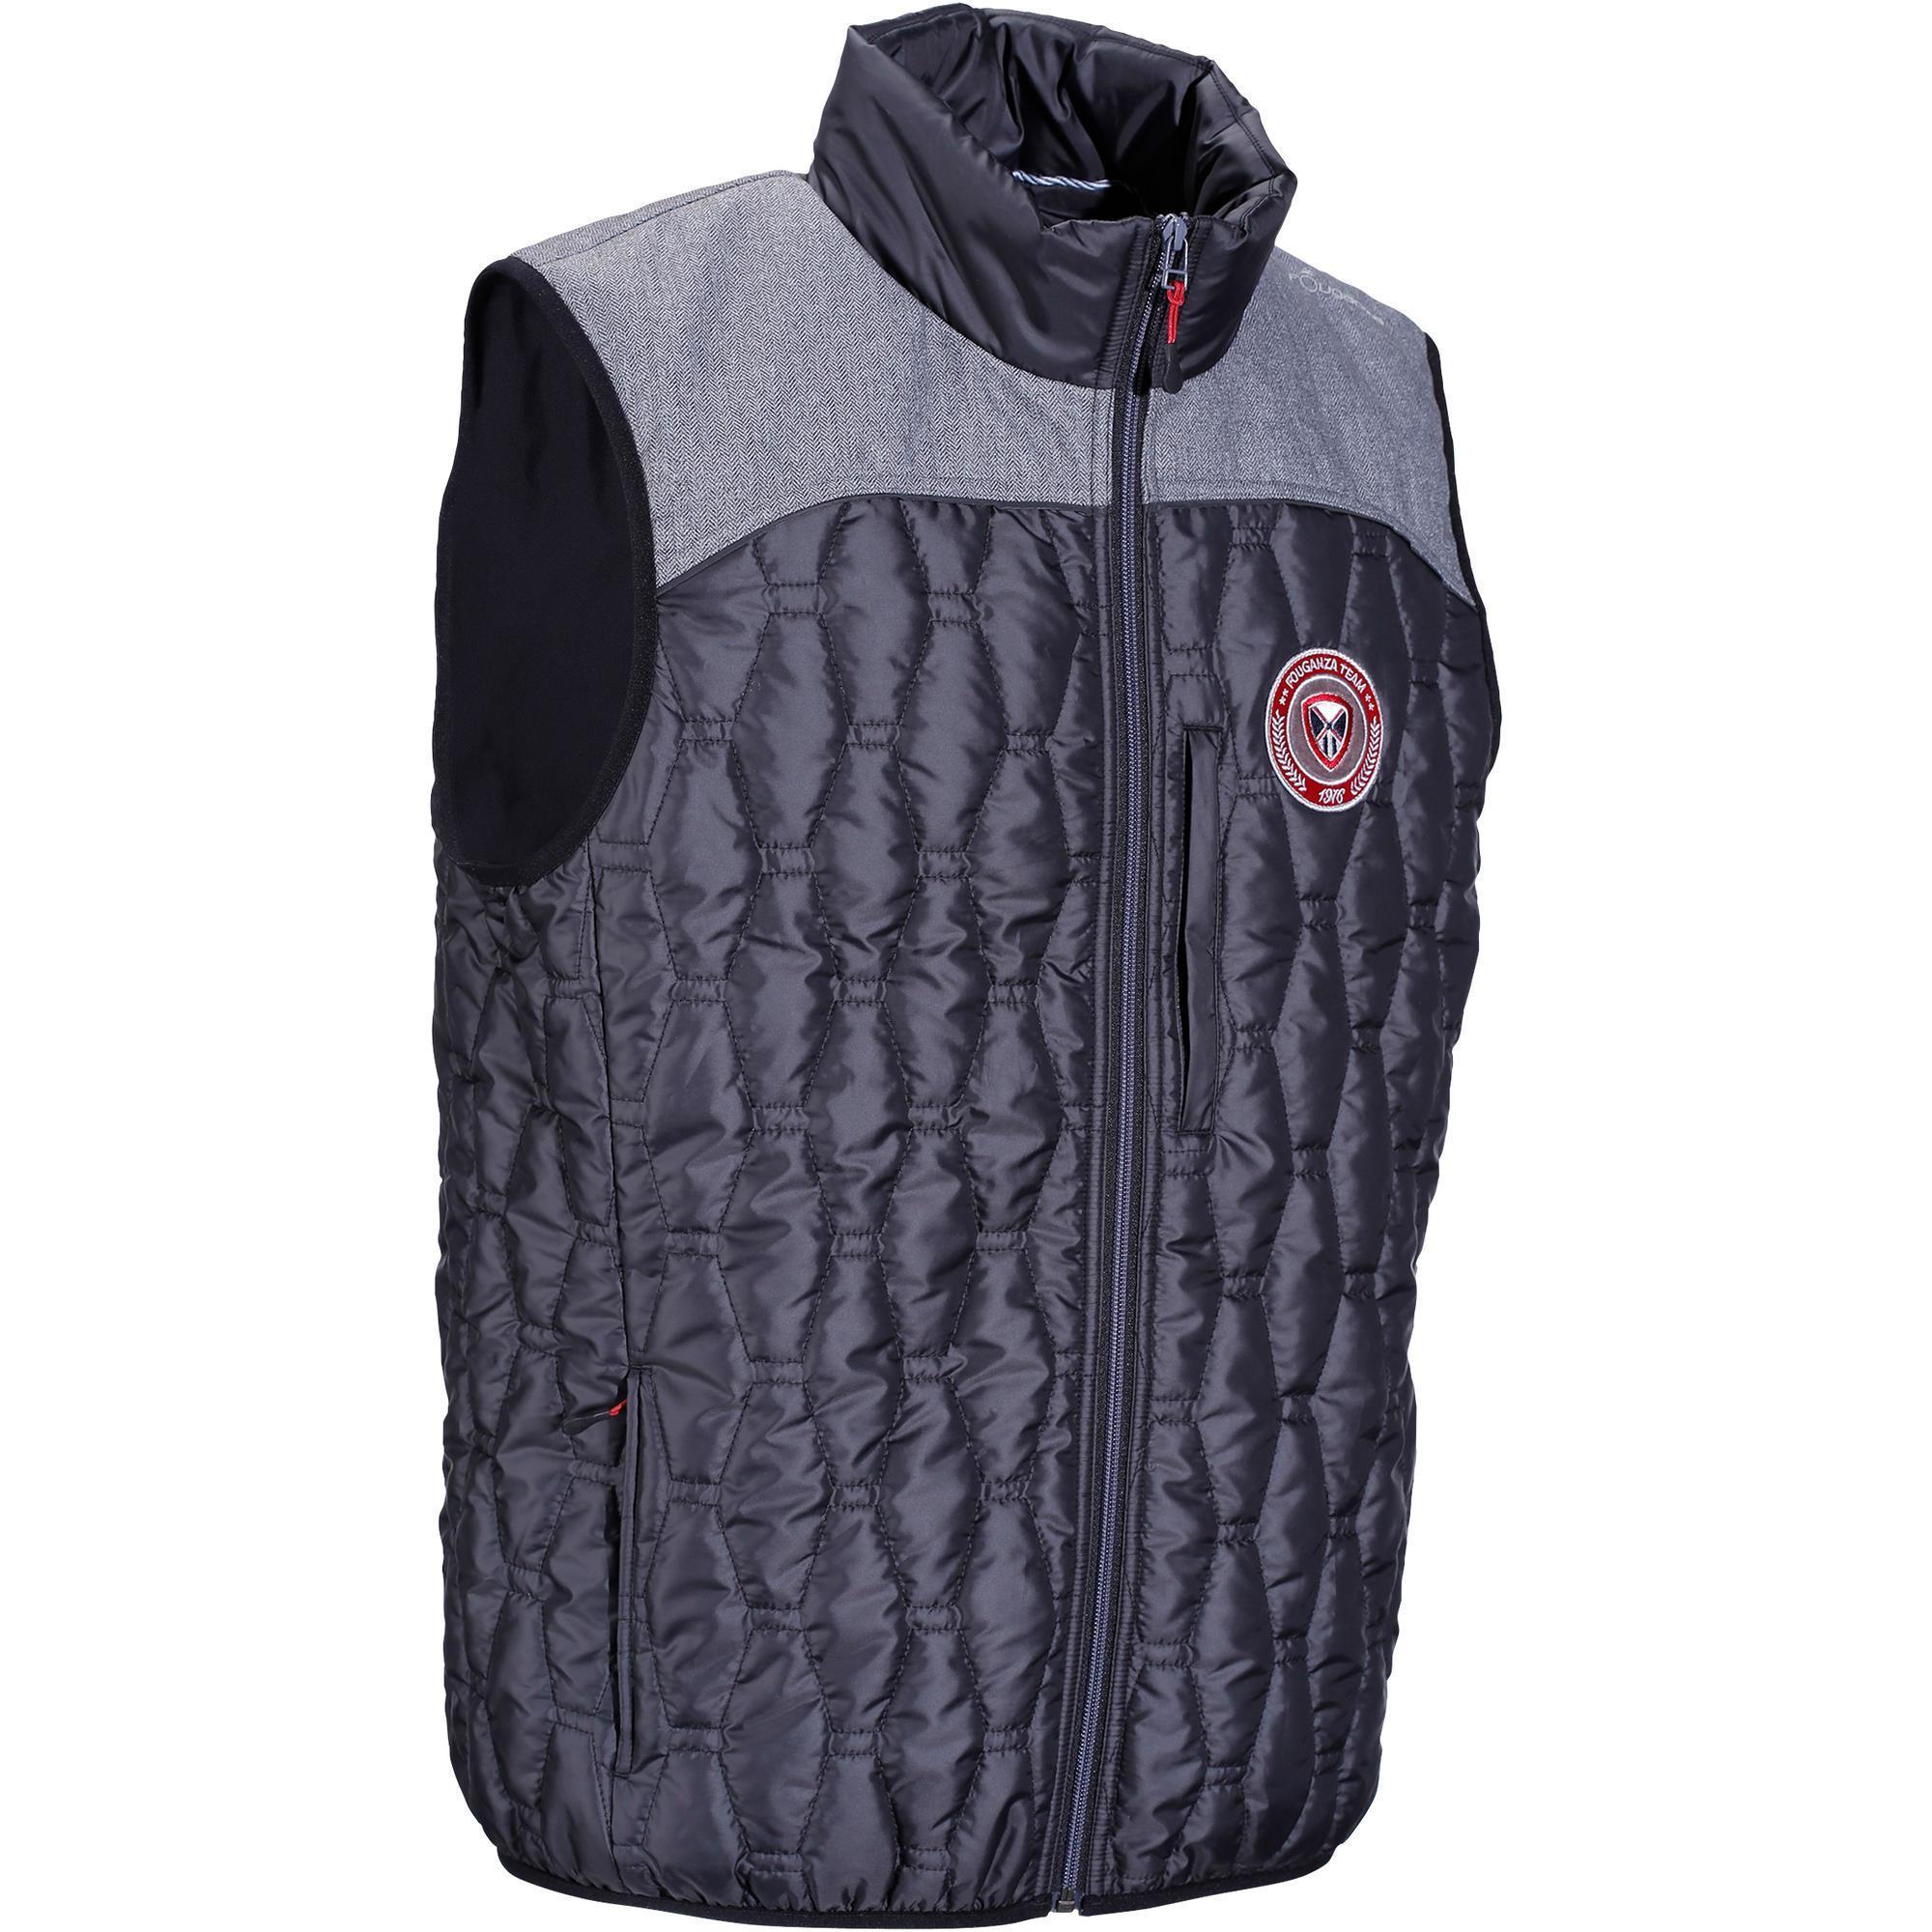 Reitweste GL700 Herren schwarz/grau   Sportbekleidung > Sportwesten > Funktionswesten   Grau   Fouganza